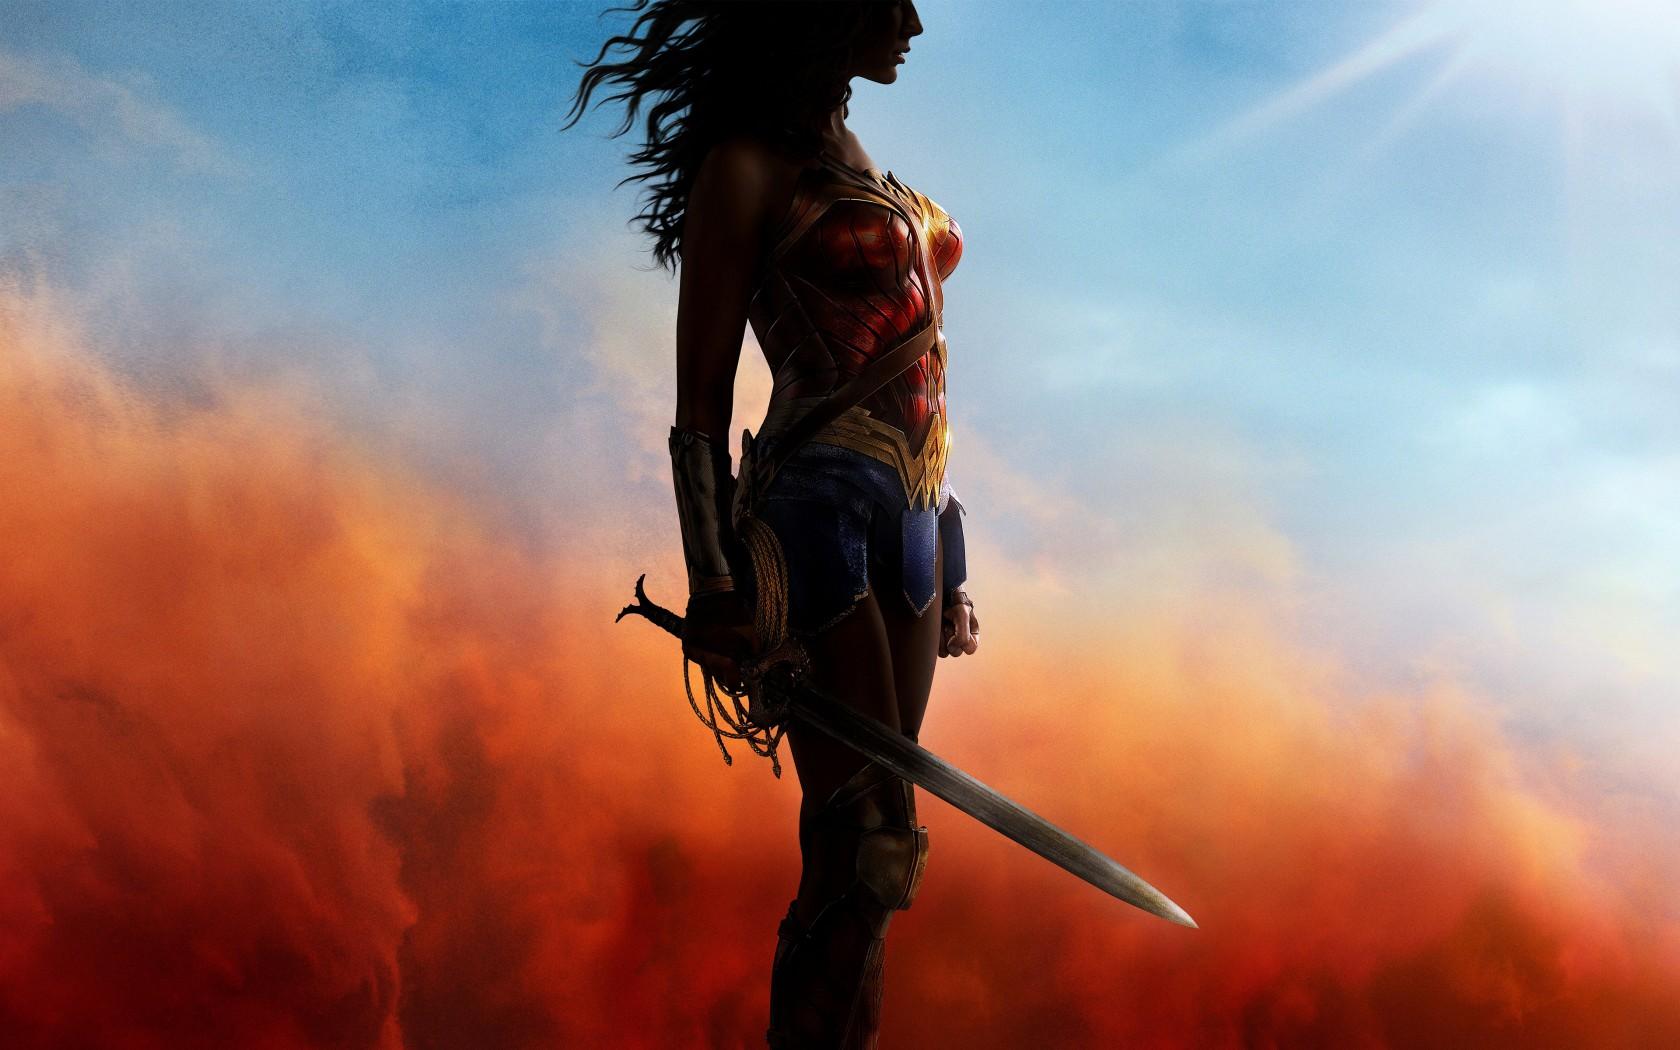 Wonder Woman Wallpaper Iphone X 2017 Wonder Woman Wallpapers Hd Wallpapers Id 18453